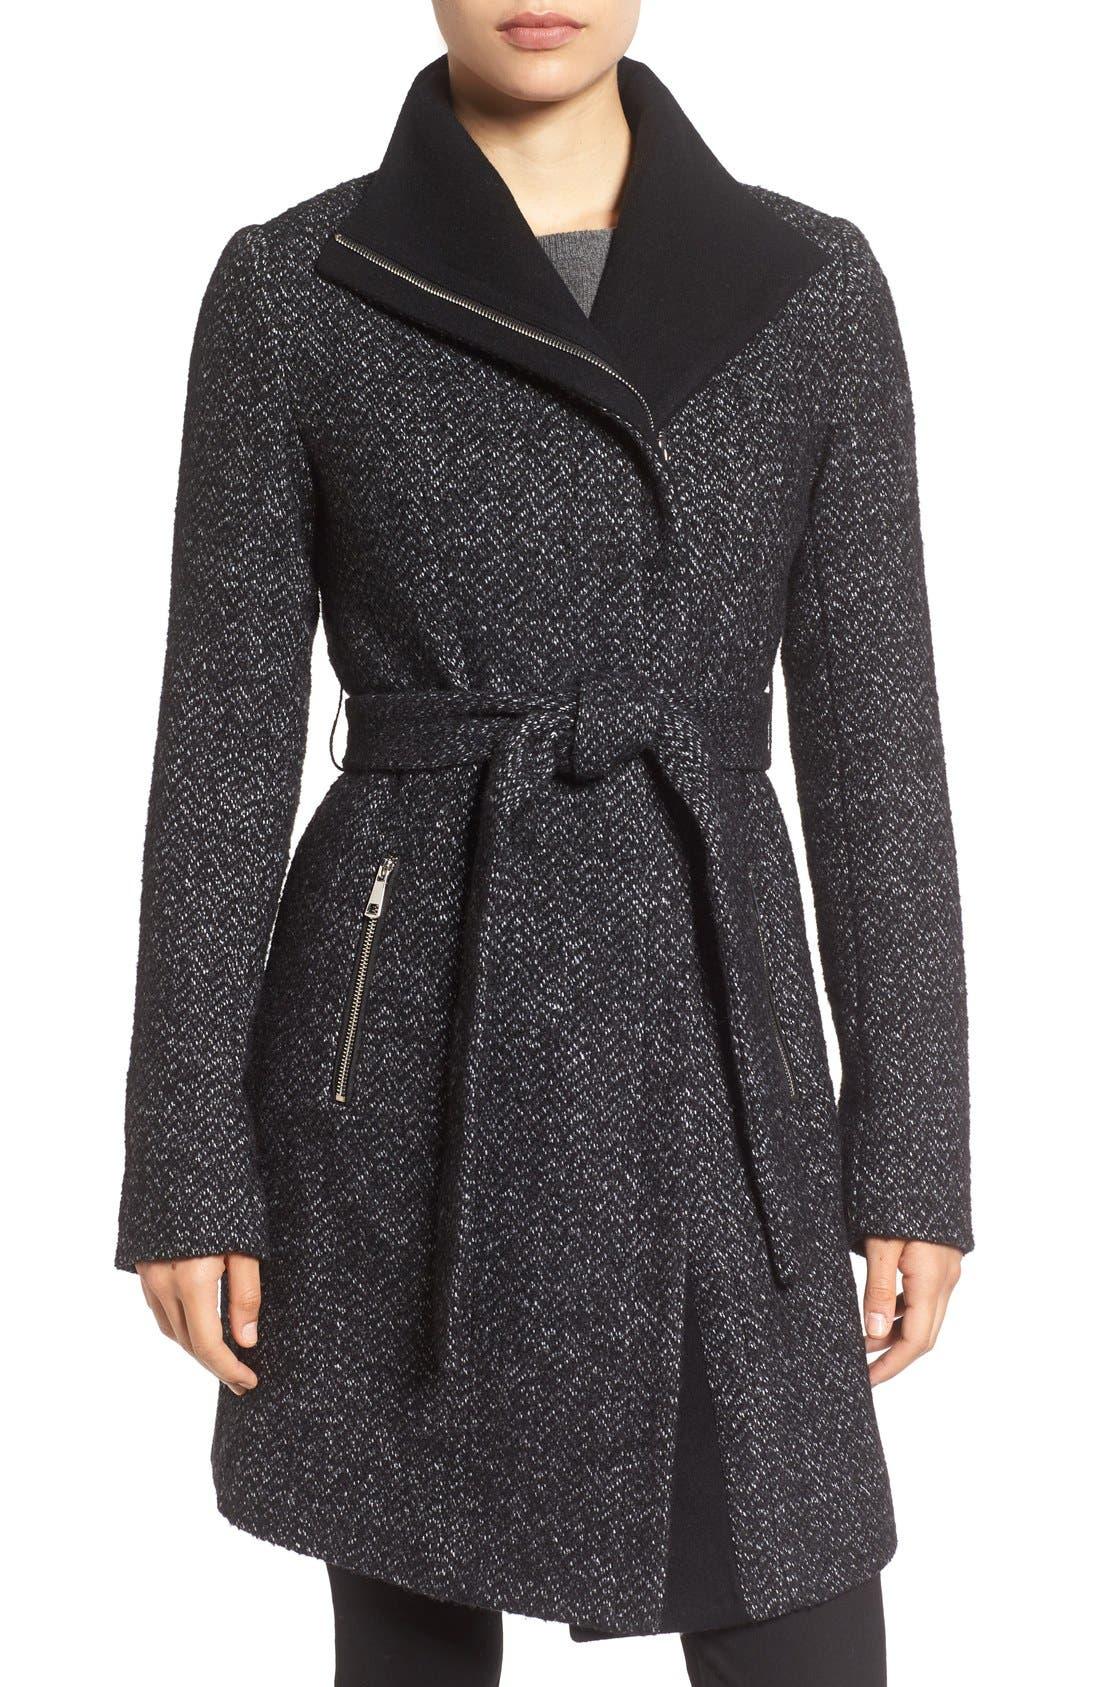 'Eva' Belted Tweed Jacket, Main, color, 008